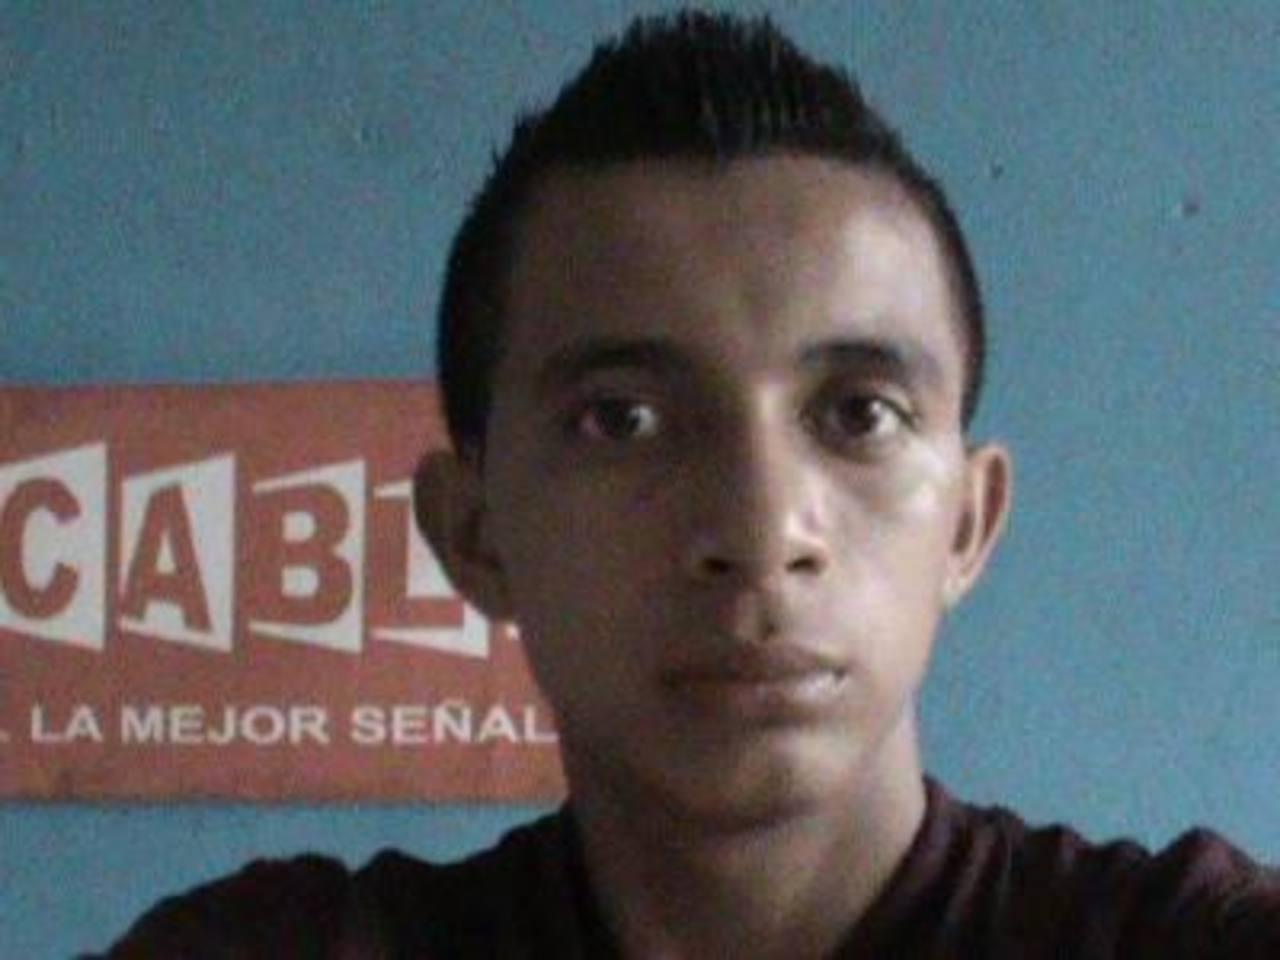 Asesinan a tercer periodista en menos de una semana en Guatemala